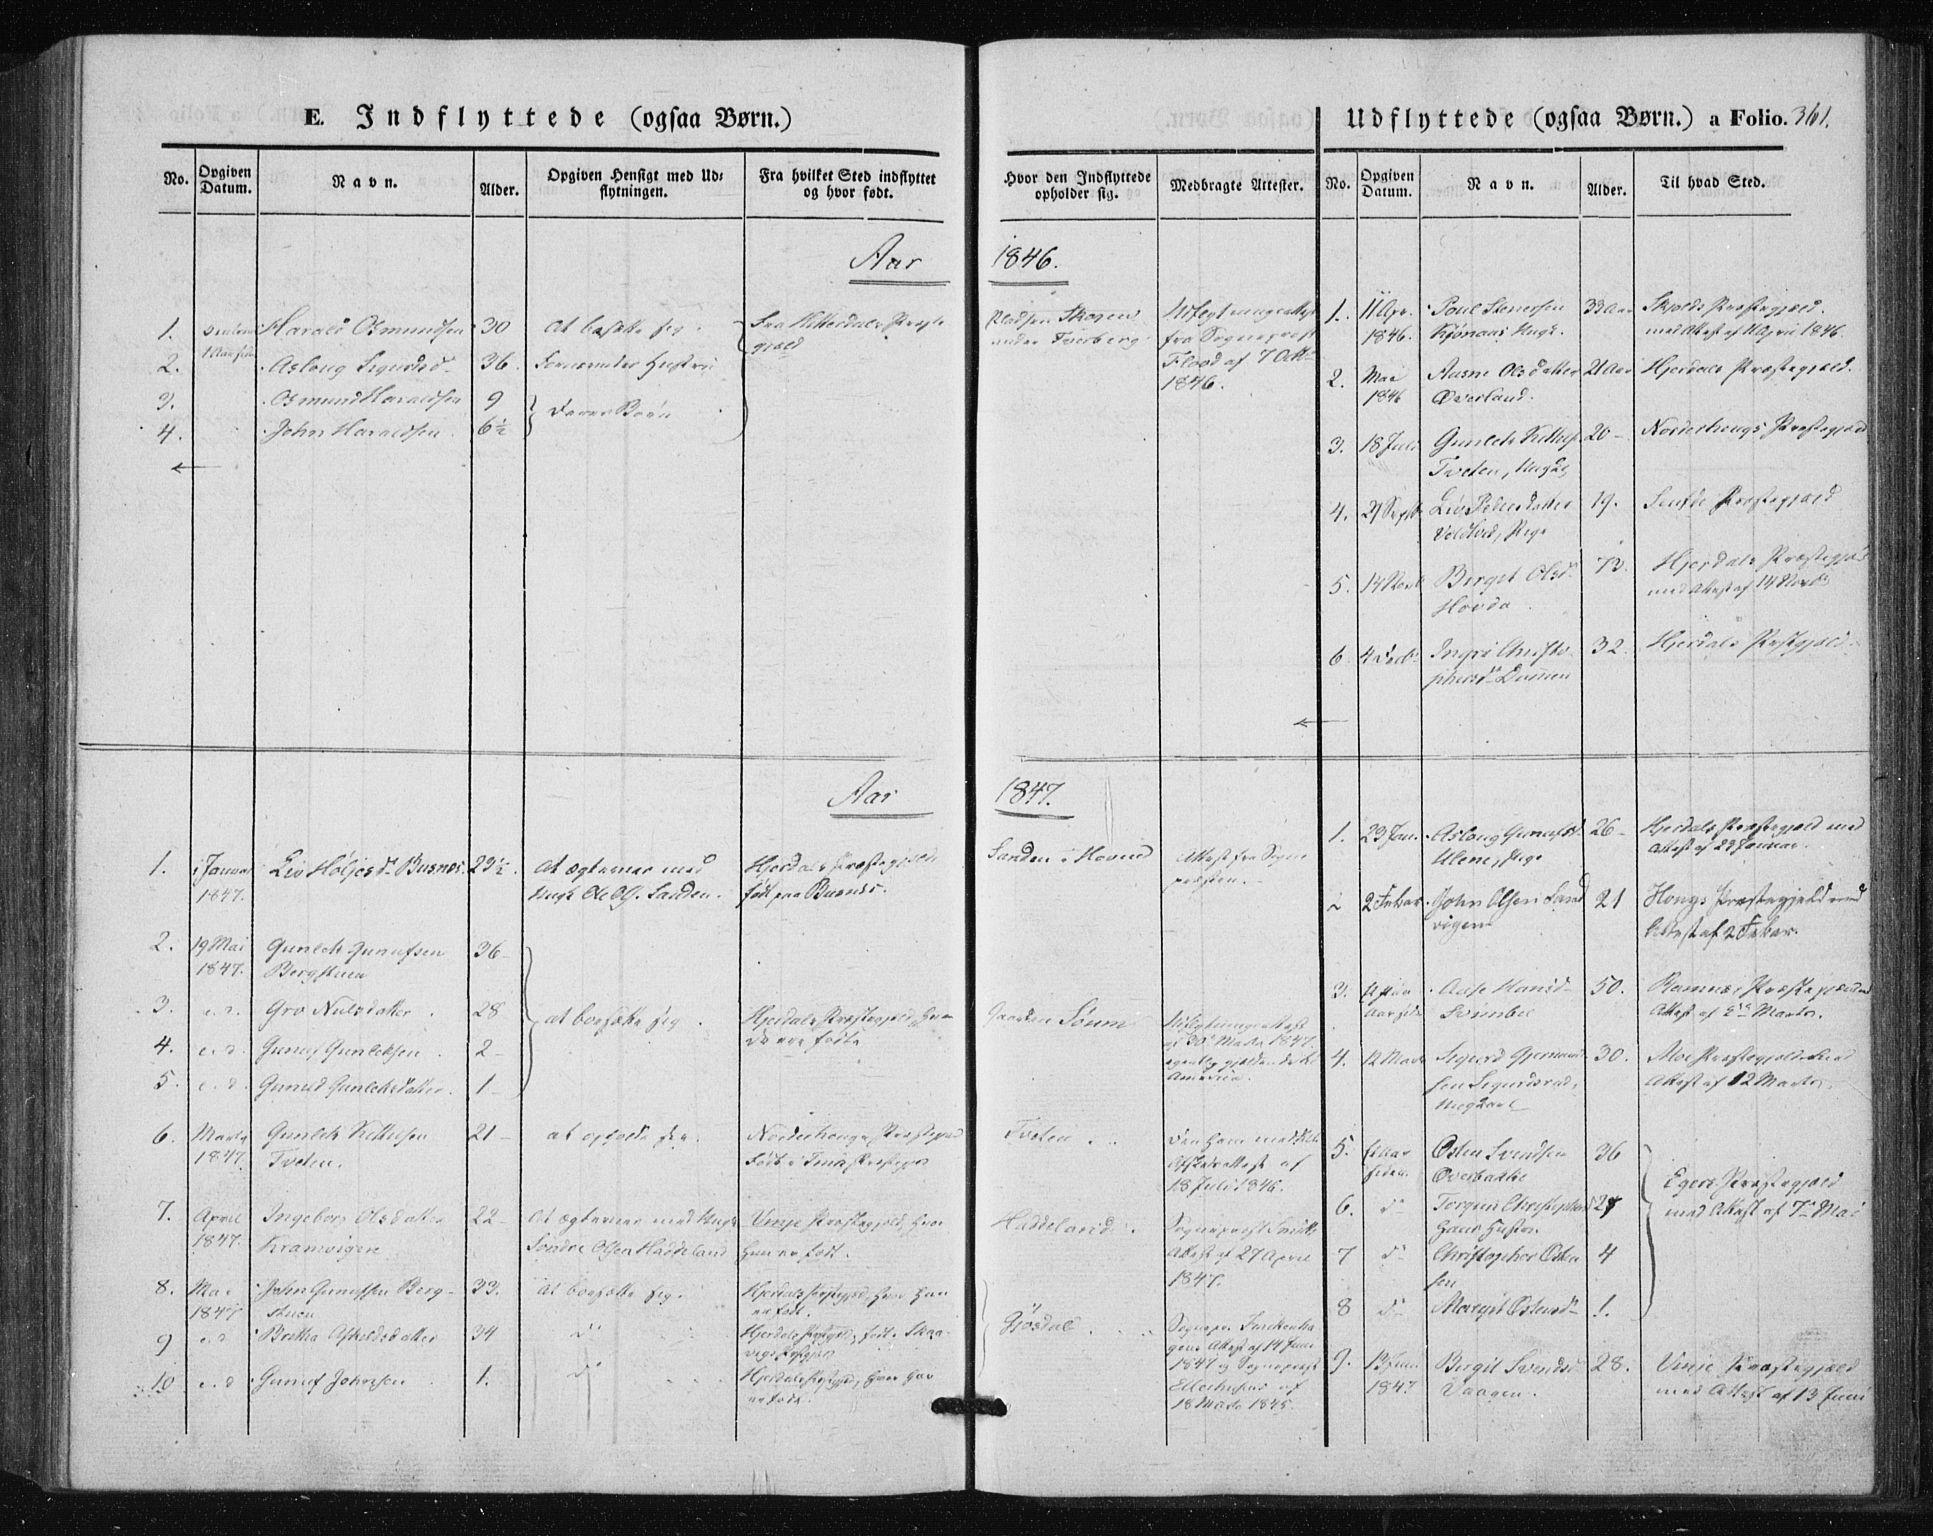 SAKO, Tinn kirkebøker, F/Fa/L0005: Ministerialbok nr. I 5, 1844-1856, s. 361